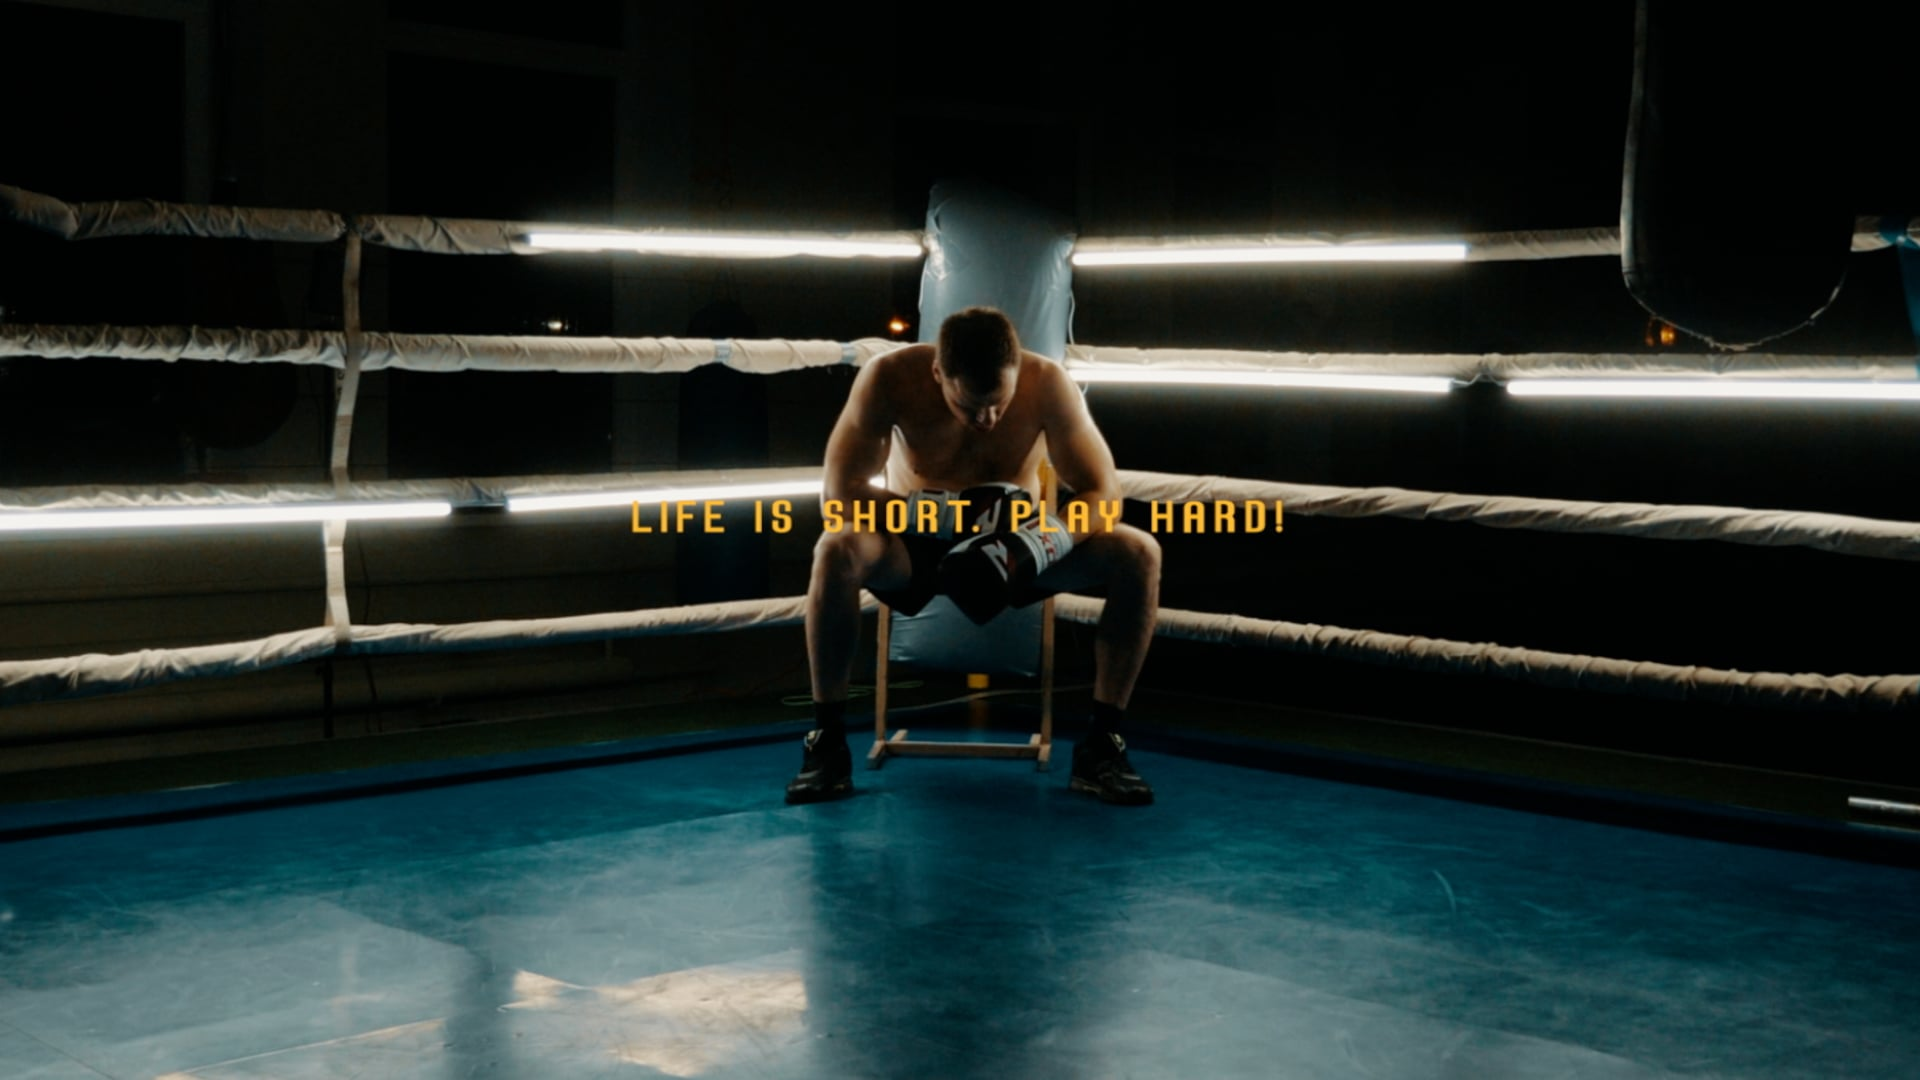 Life is short. Play hard!